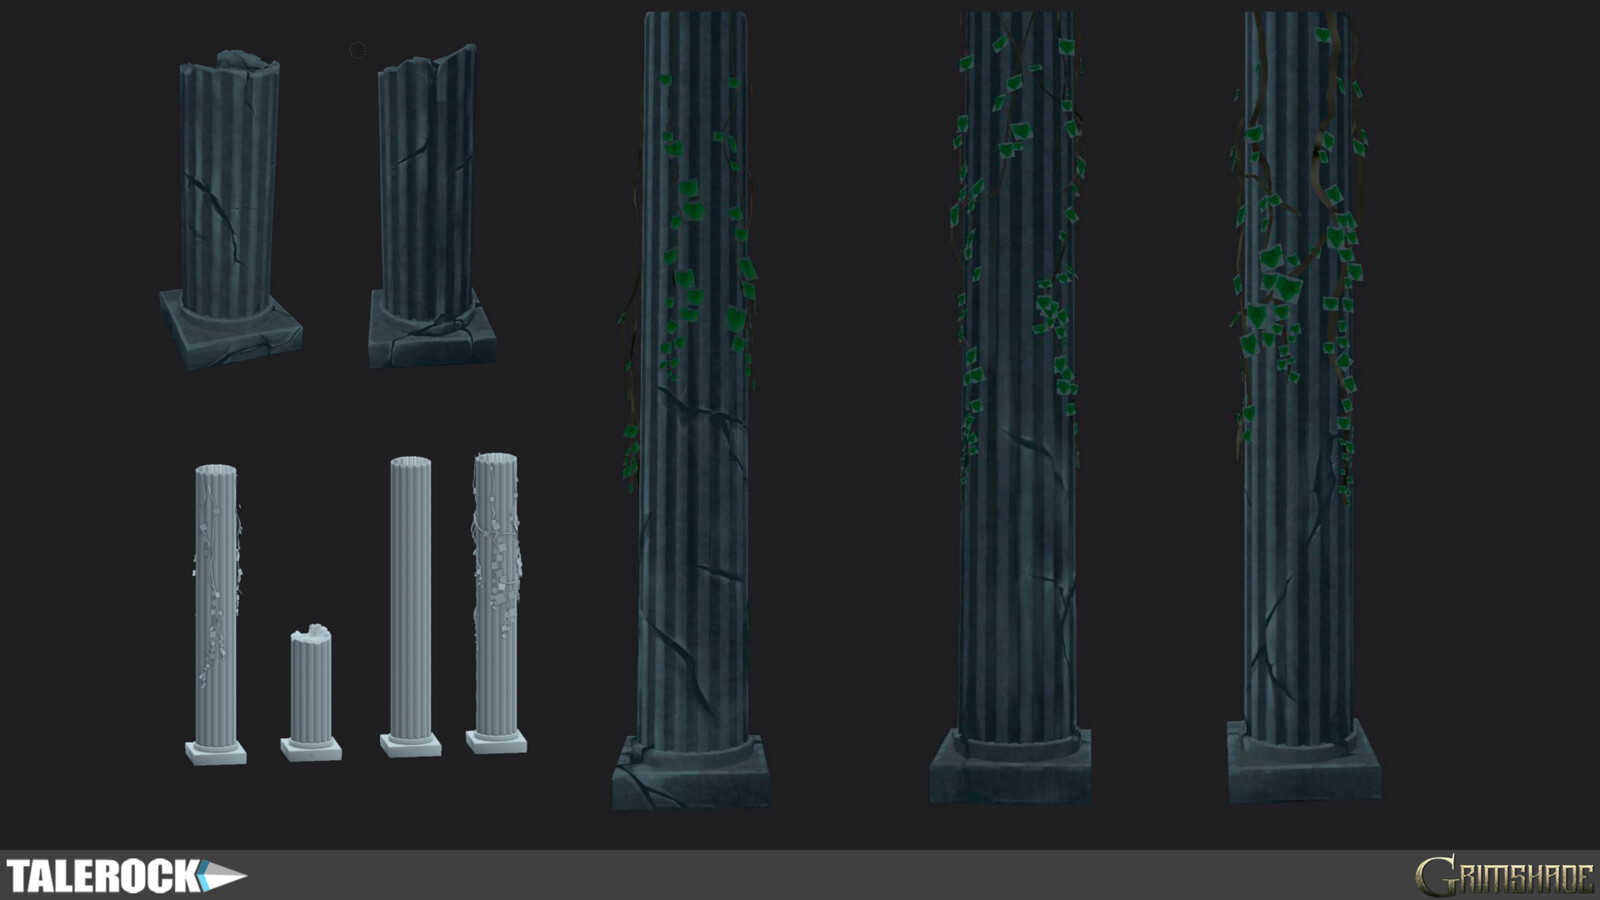 3D models and textures